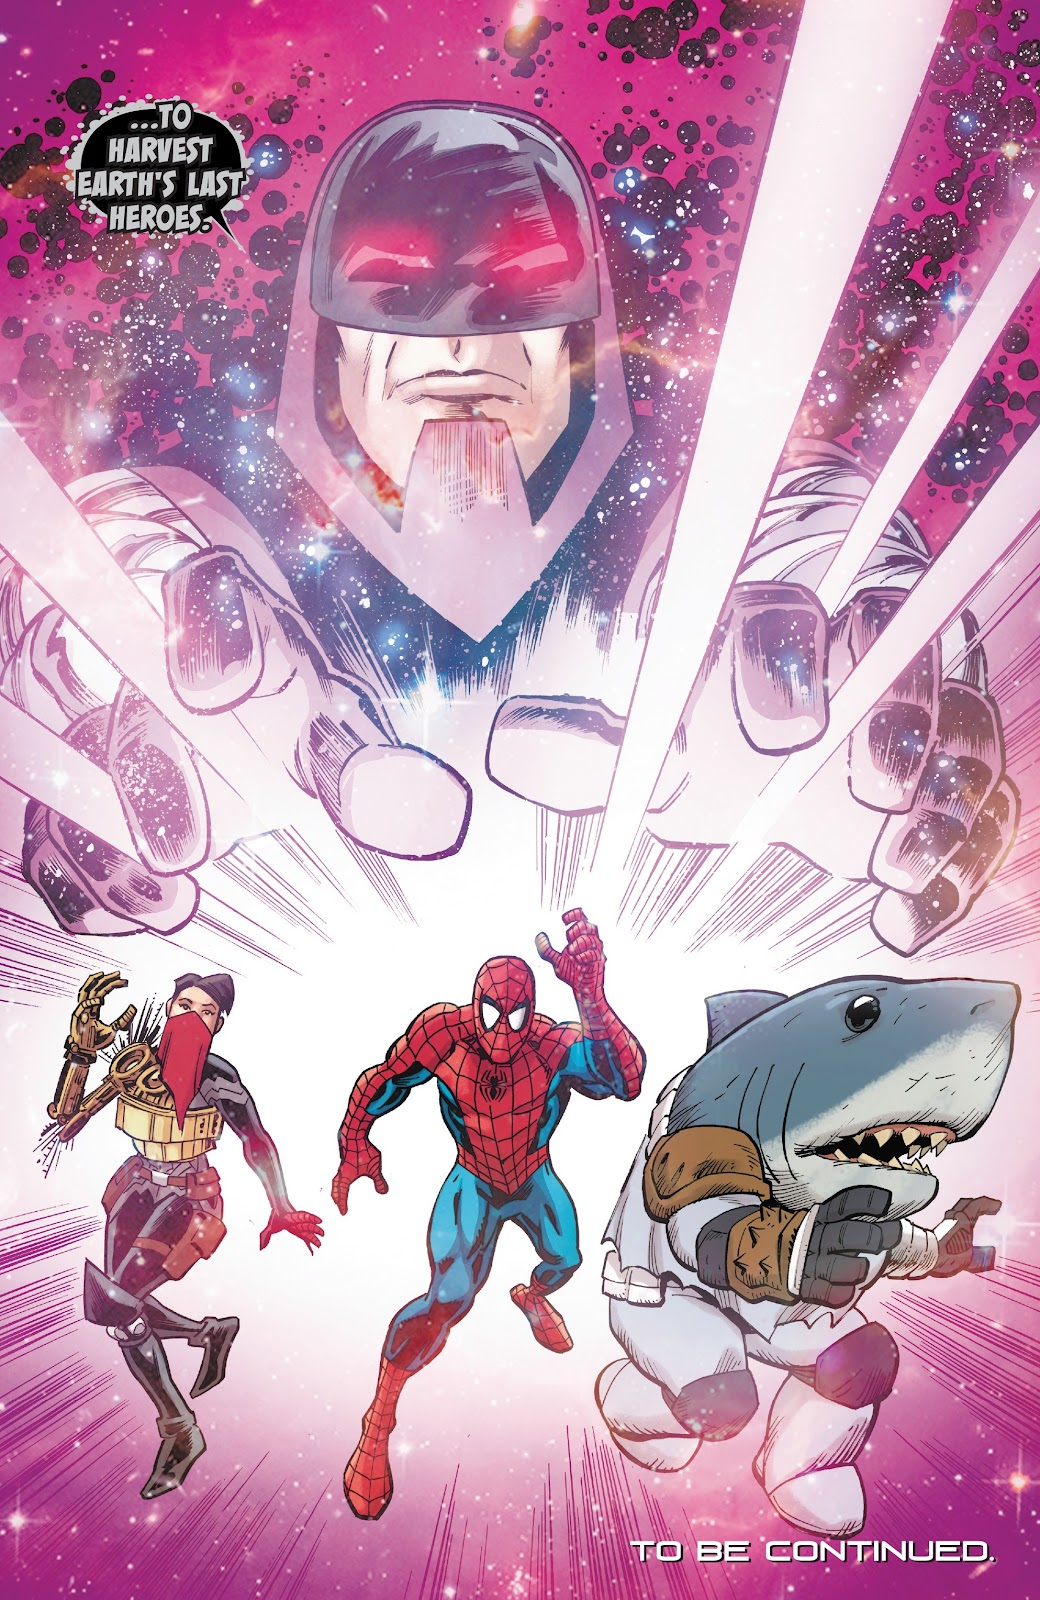 Read online Spider-Man/Deadpool comic -  Issue #47 - 21